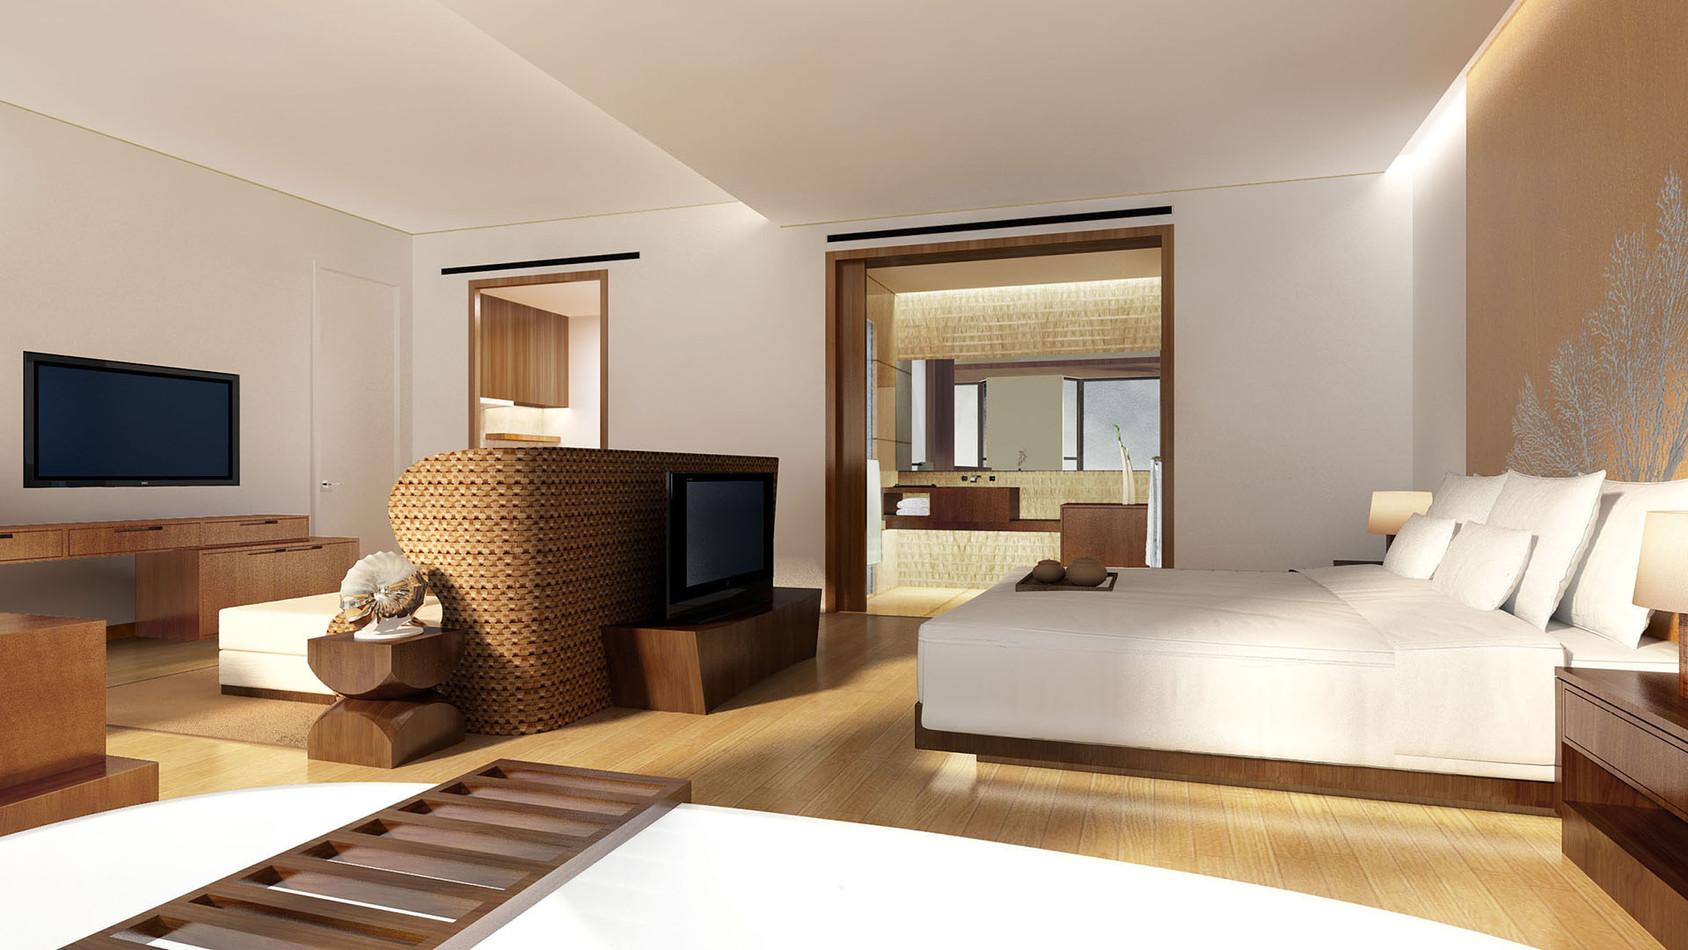 HAINAN-CROWN-PLAZA-SPA-HOTEL-EN 08.jpg